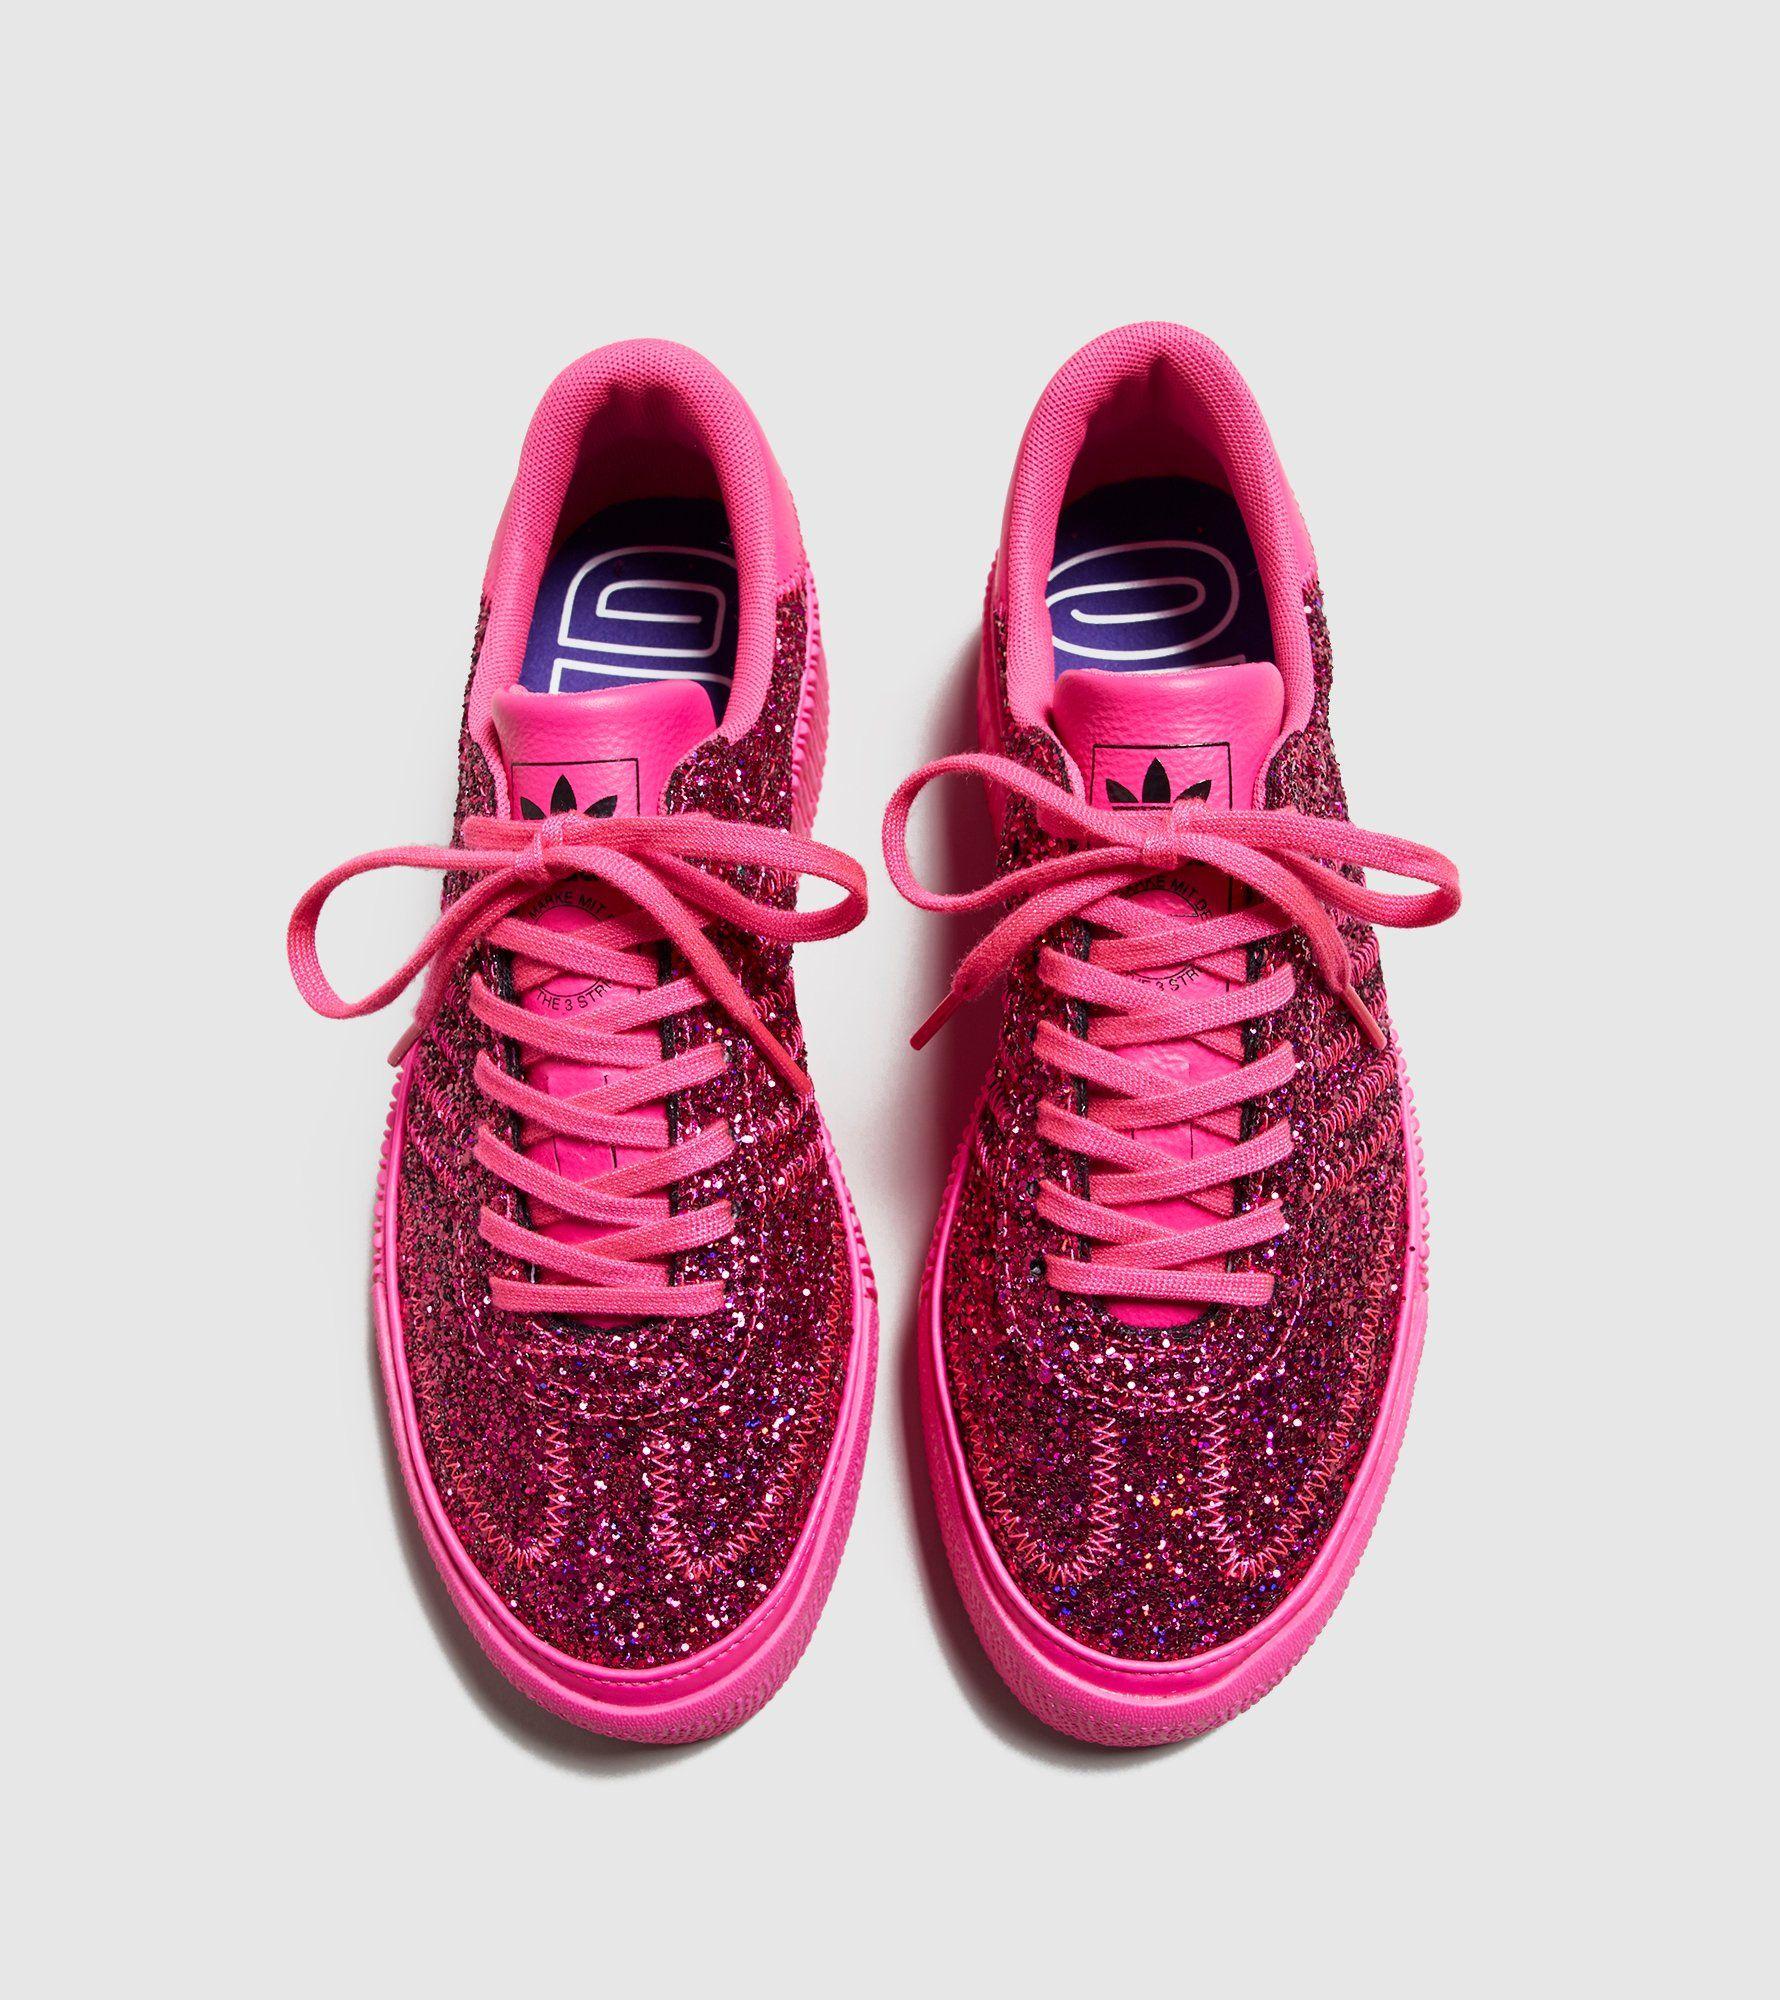 adidas Originals Samba Rose Women's